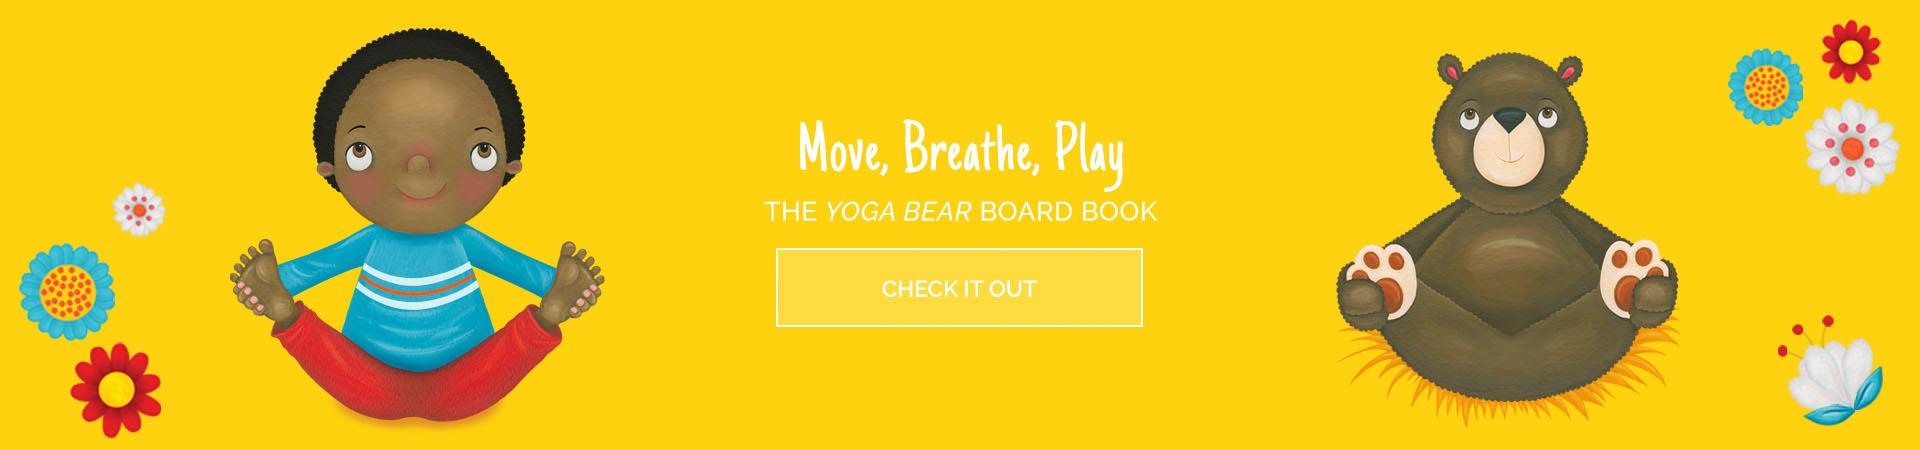 Yoga Bear Boardbook